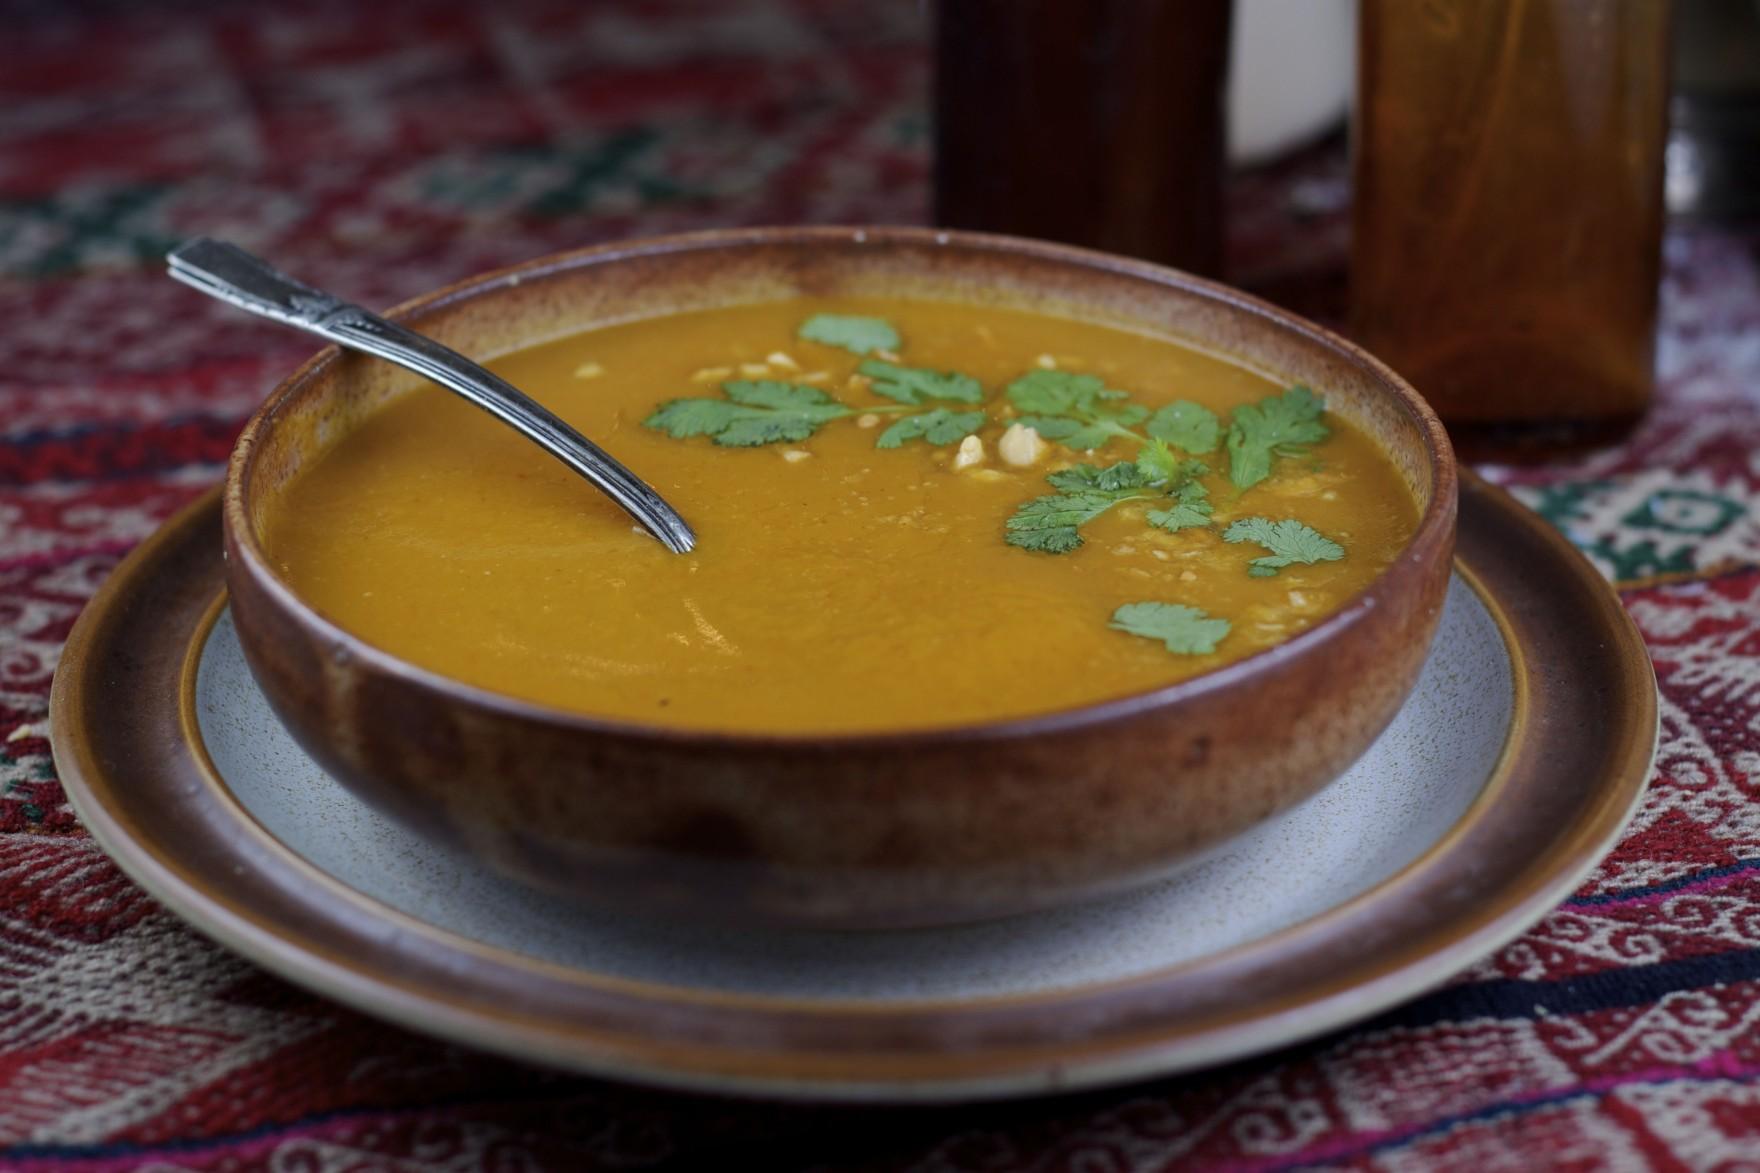 Vegan Curried Butternut Squash Soup The Bored Vegetarian